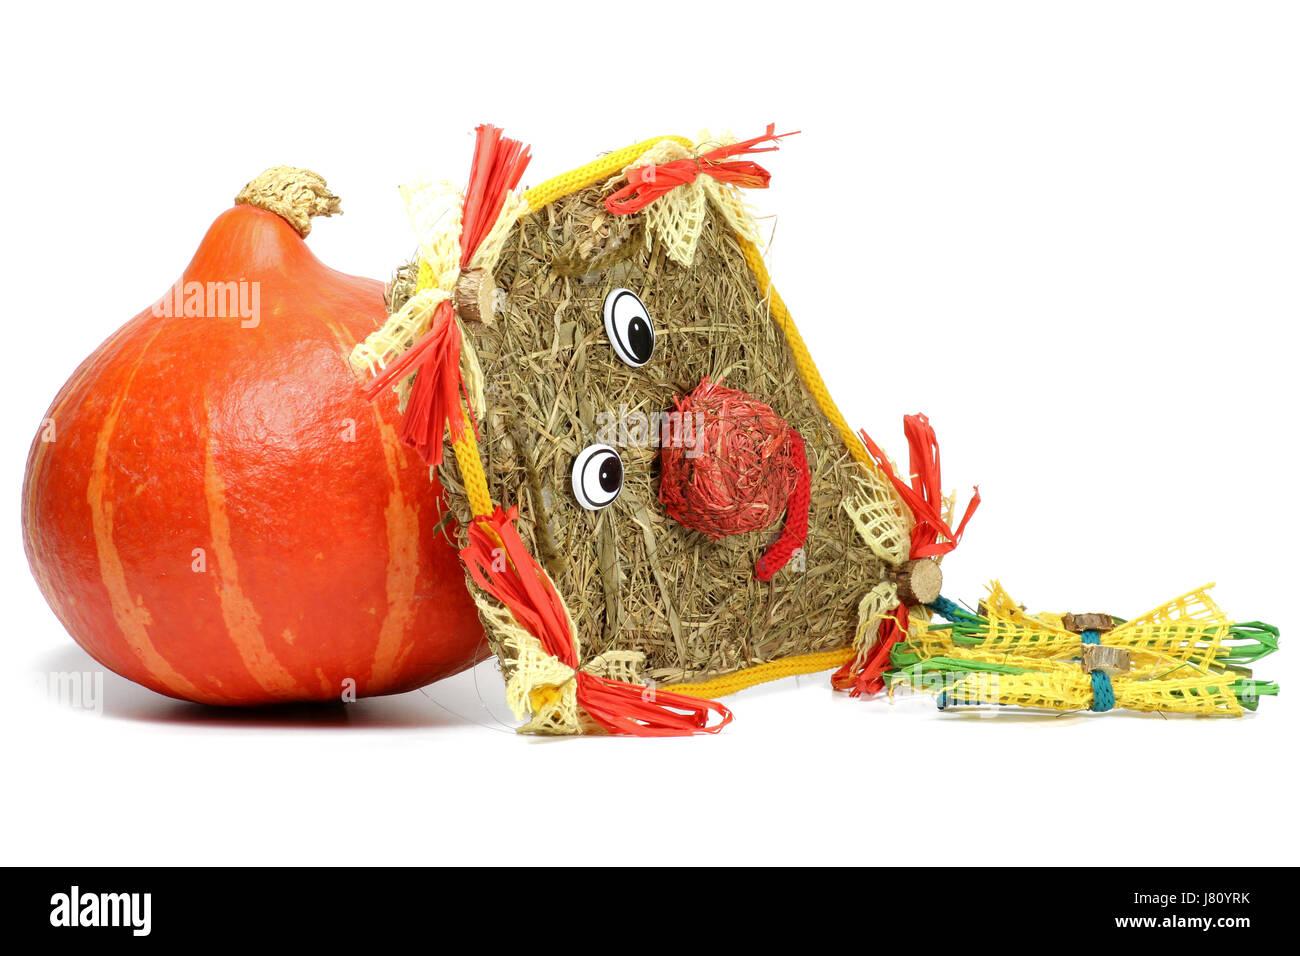 red kuri squash and kite made of straw isolated on white background Stock Photo